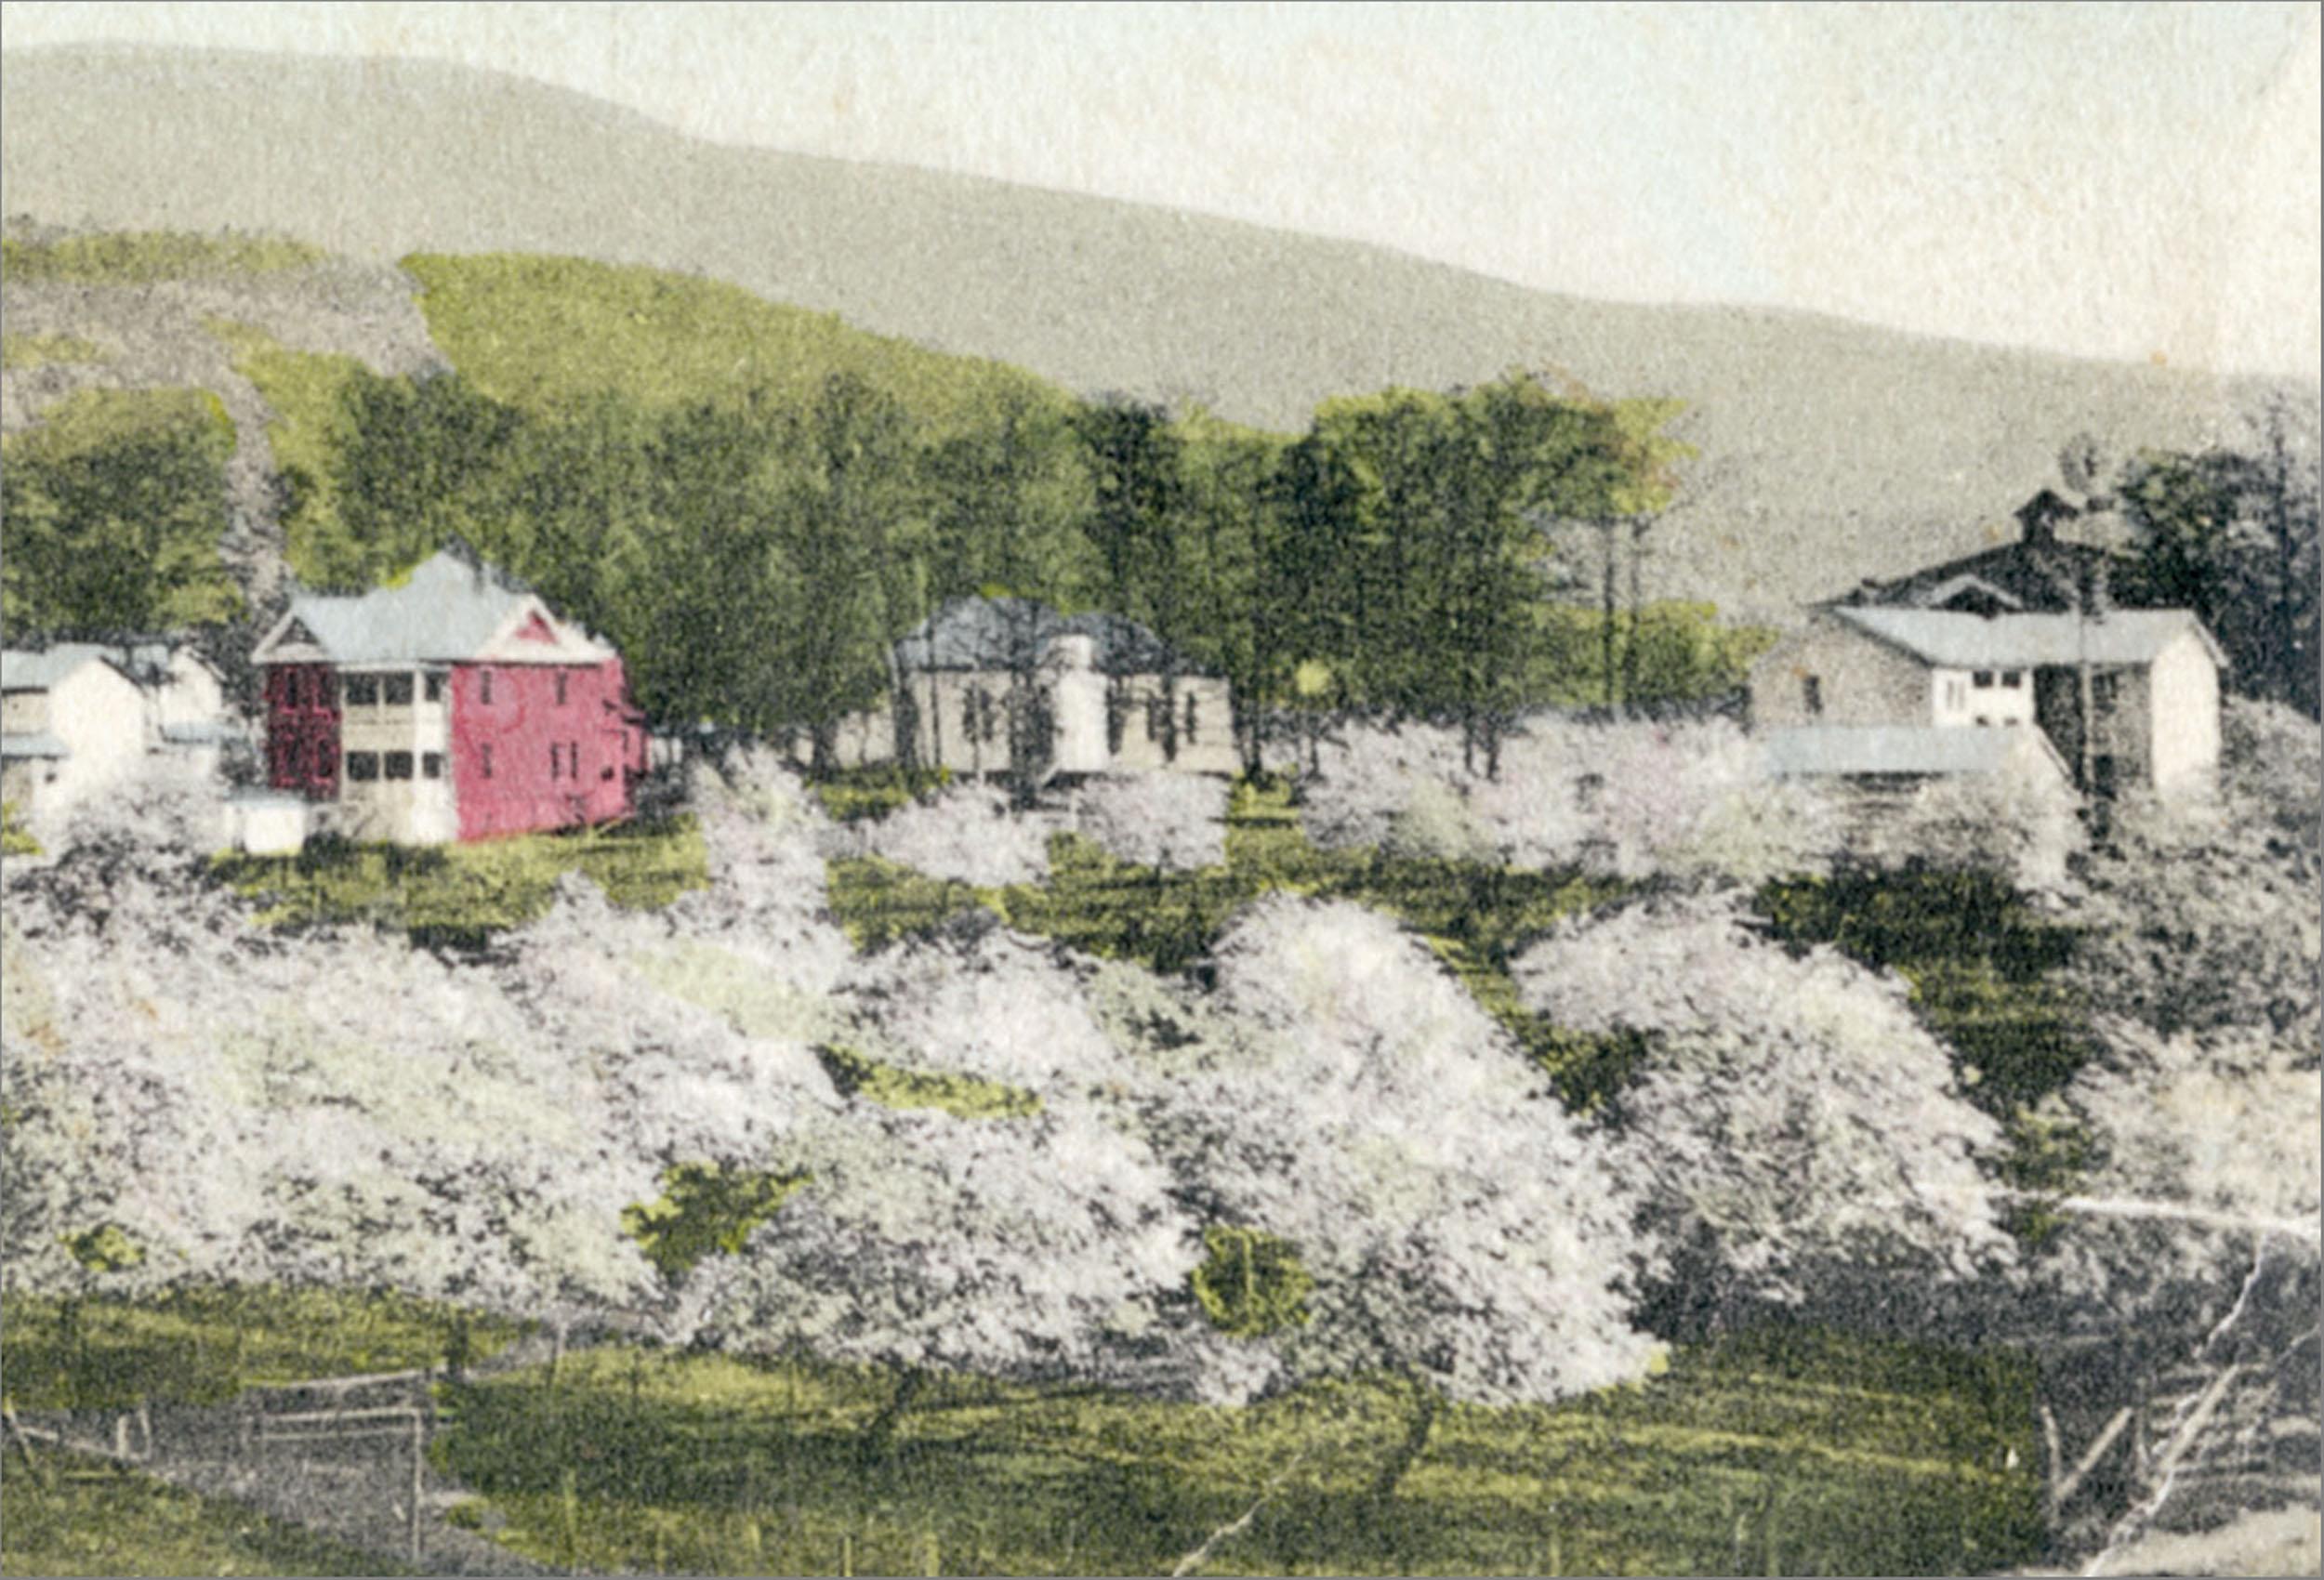 Secrets Of The Blue Ridge H Lamont Pugh From The Ragged